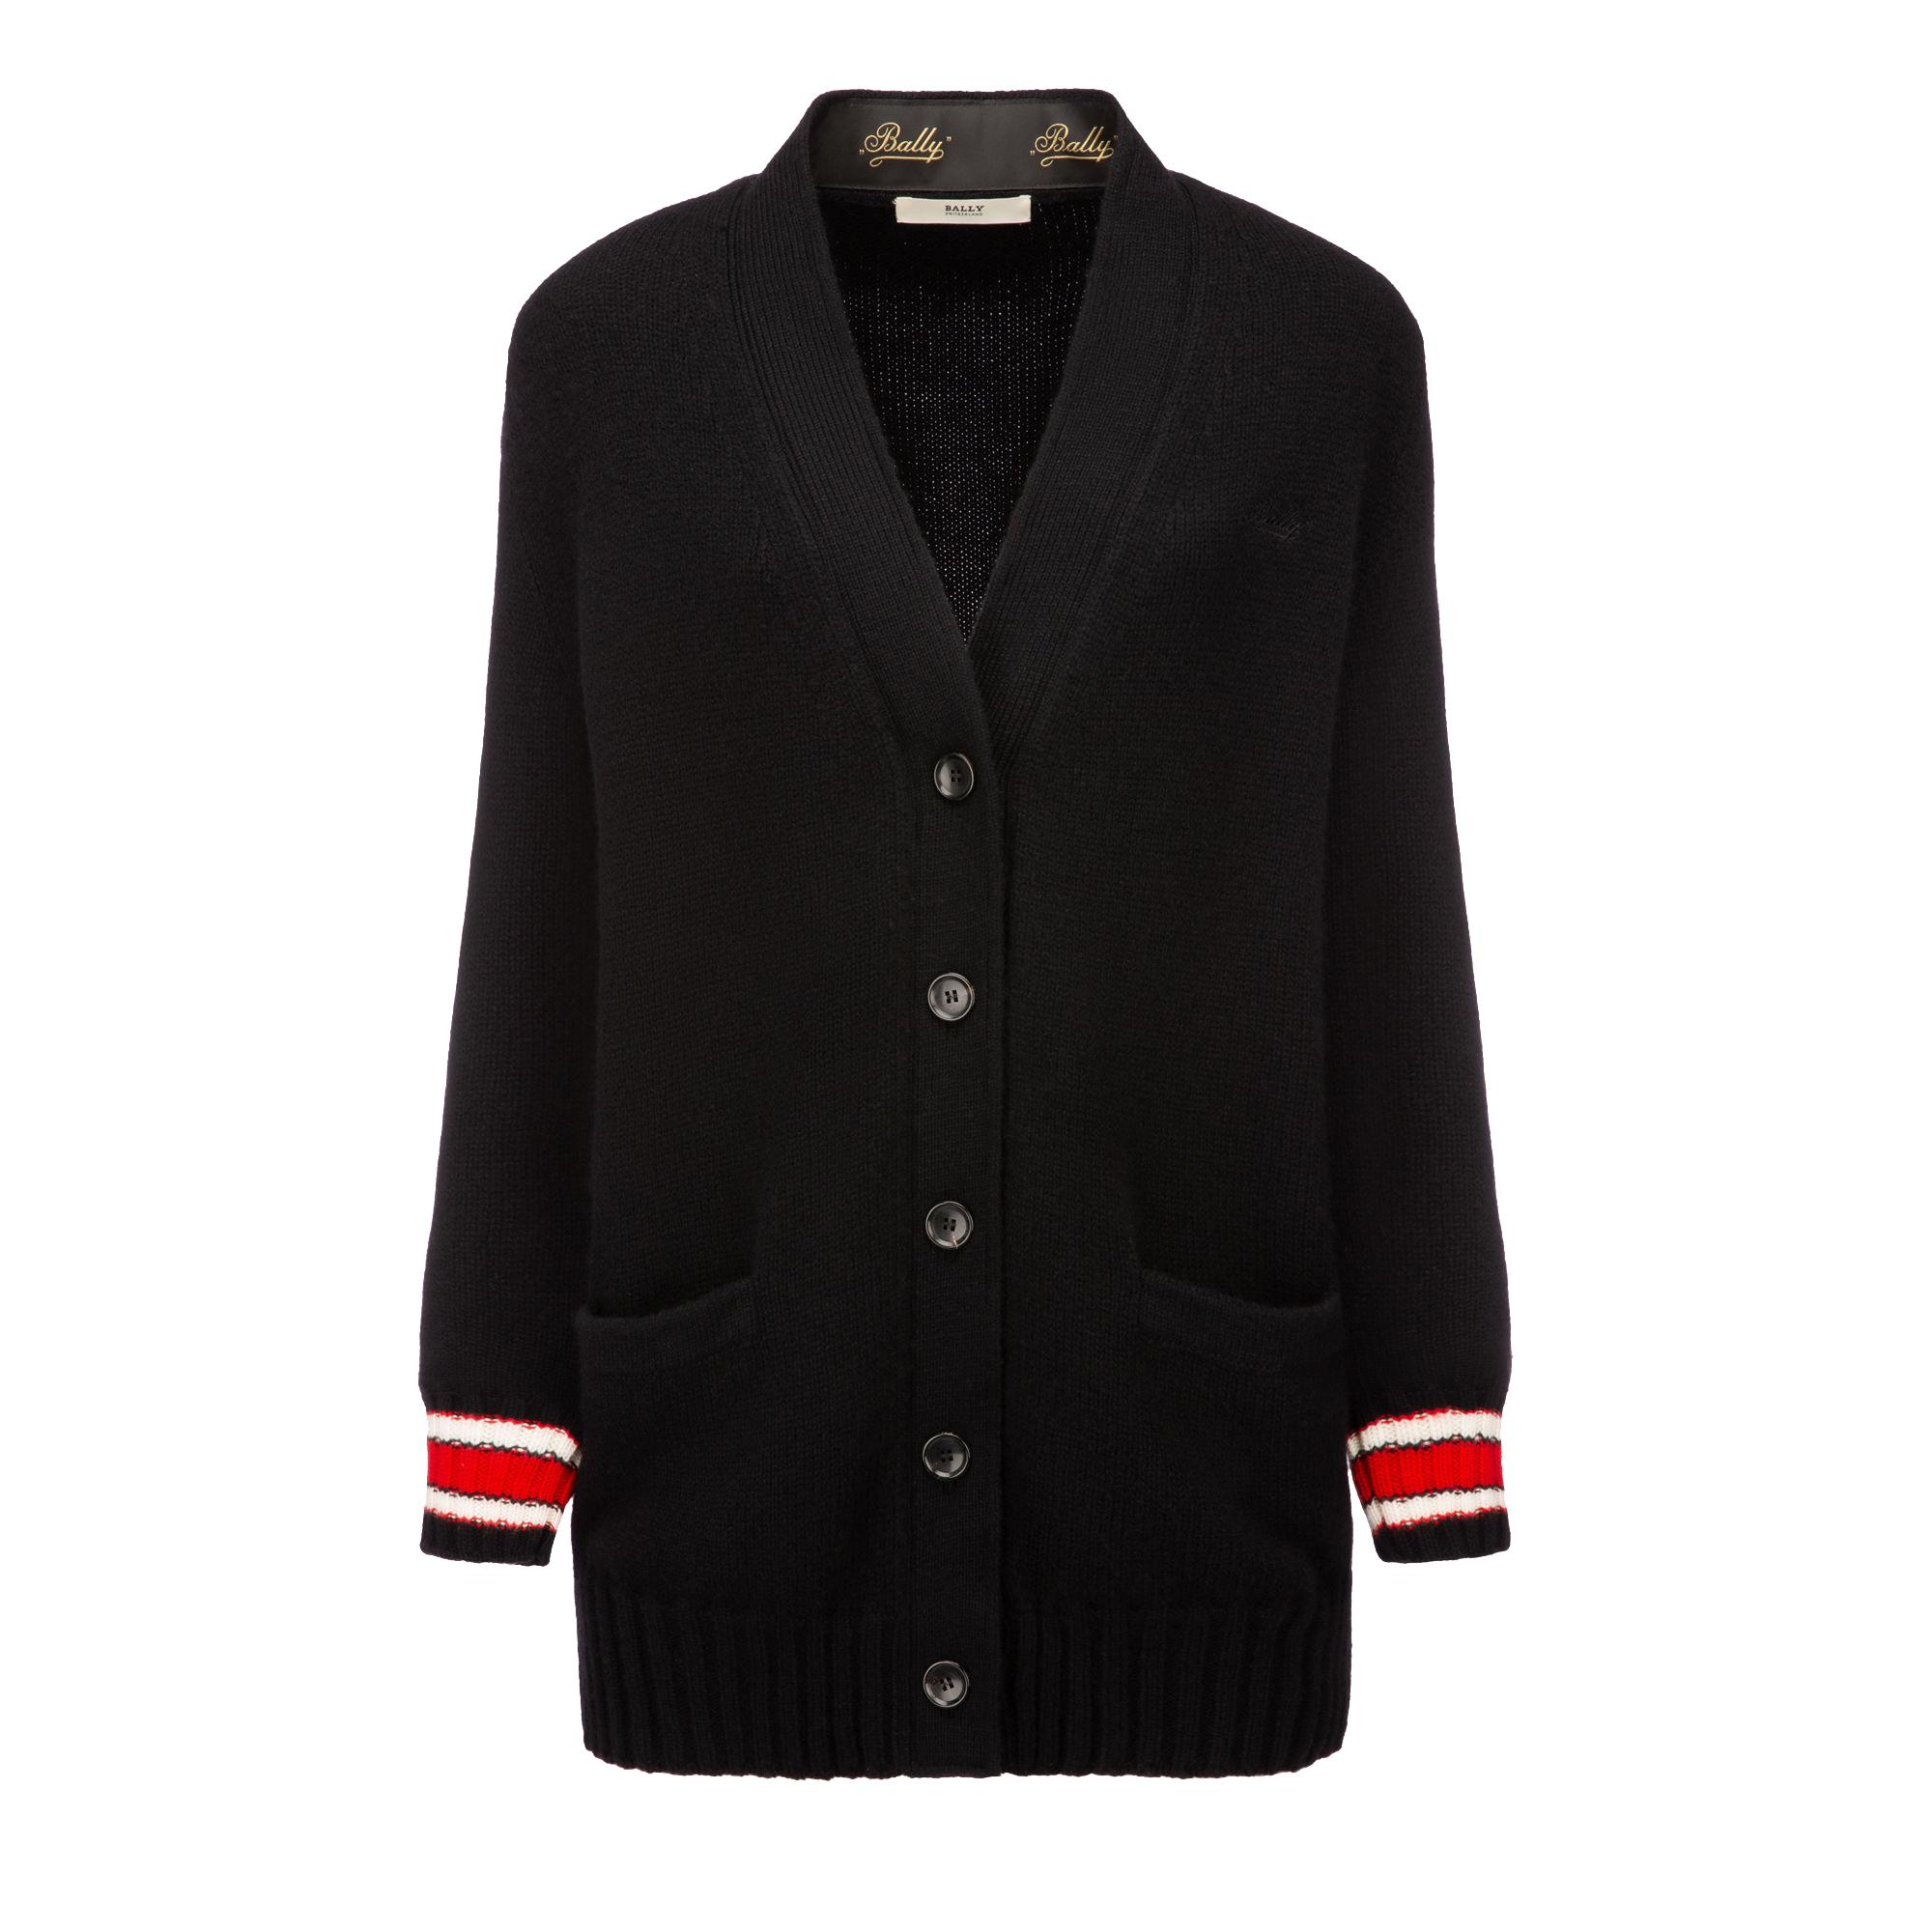 Bally Wool-Cashmere Long Cardigan